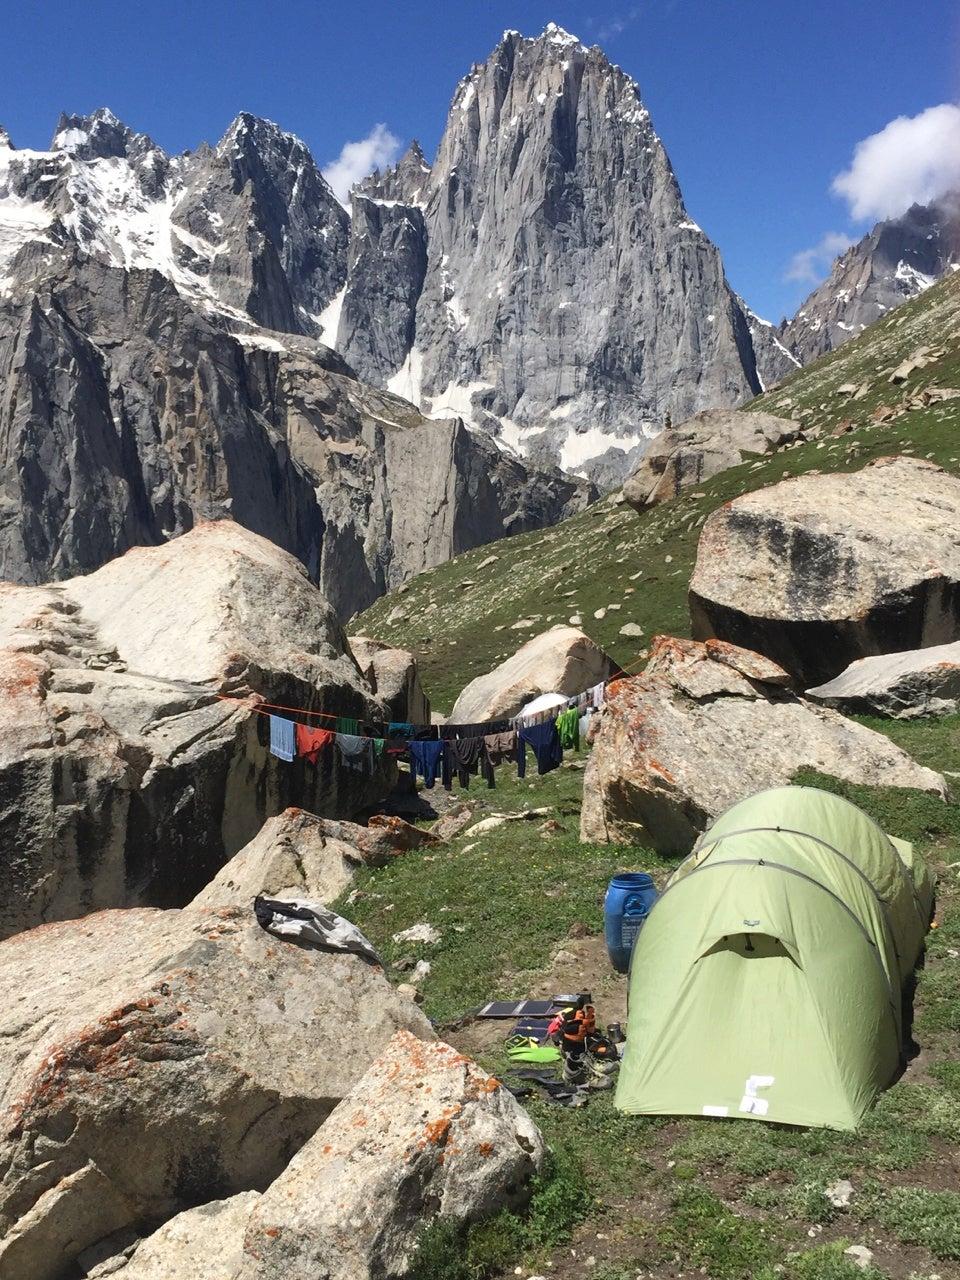 PHOTOS: A Summer In The Pakistani Karakoram